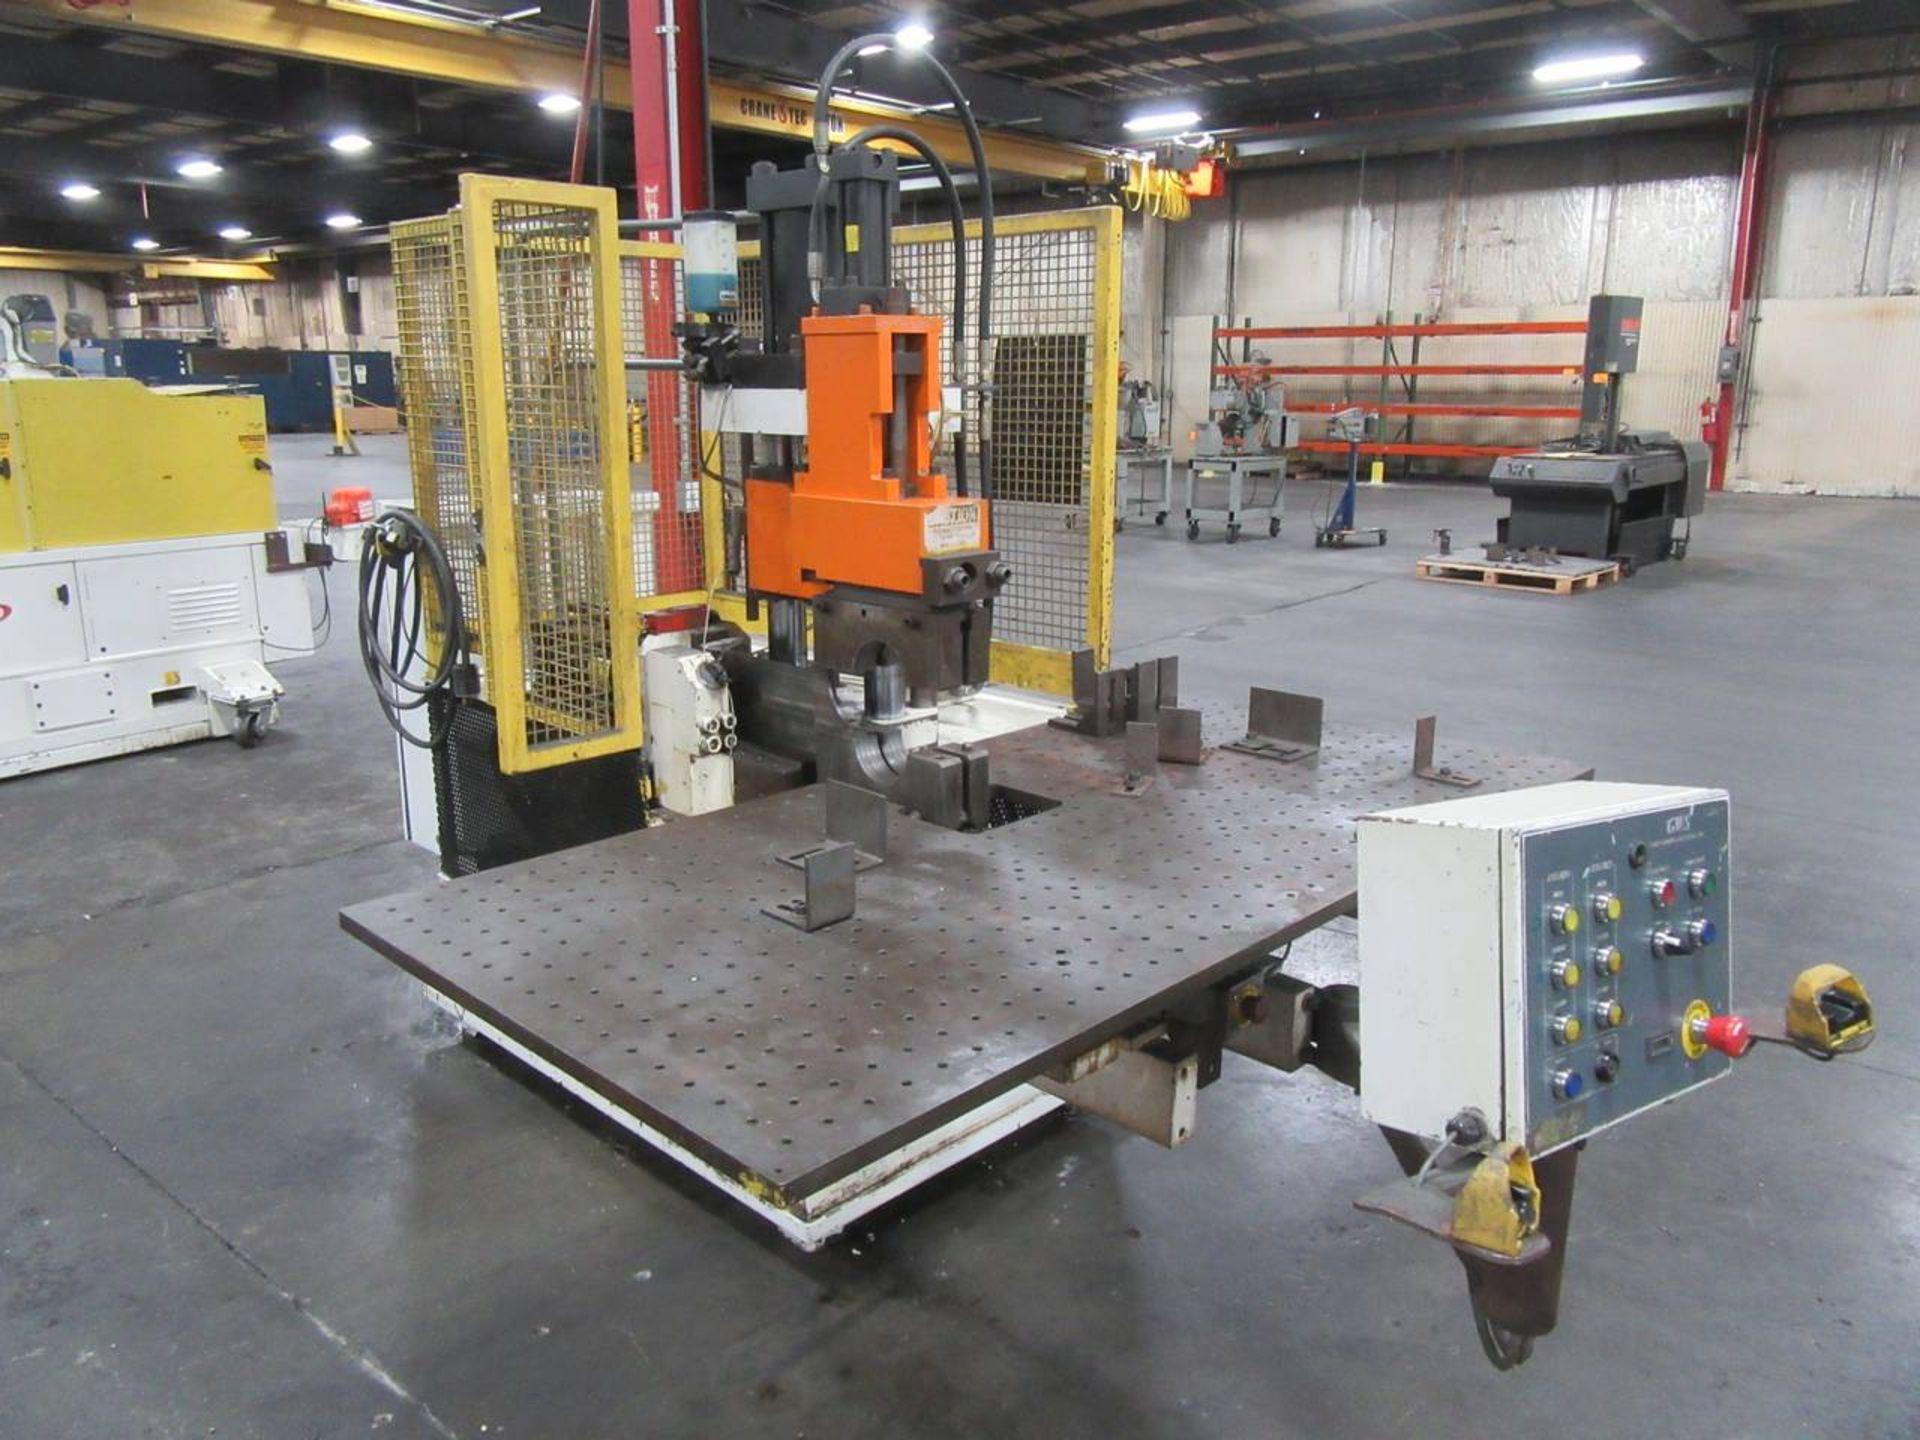 Lot 21 - 2018 GWS Tool Forming Solutions TM600 Cut Off